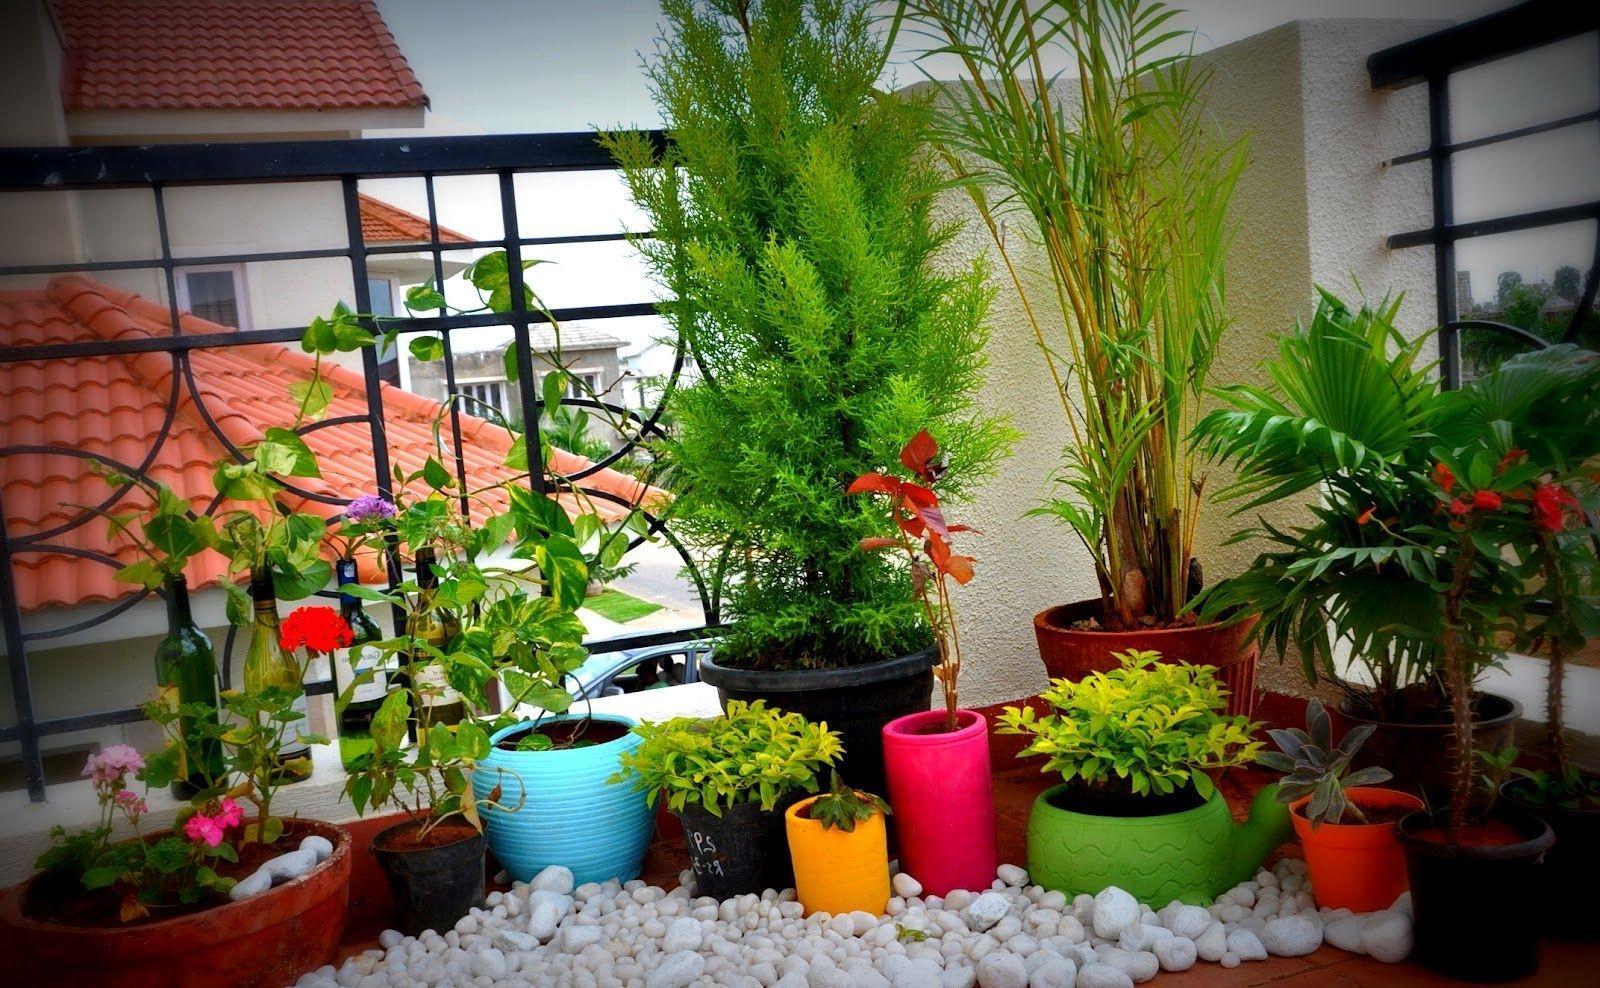 Apartment Balcony Small Balcony Garden Ideas Home Designs Inspiration